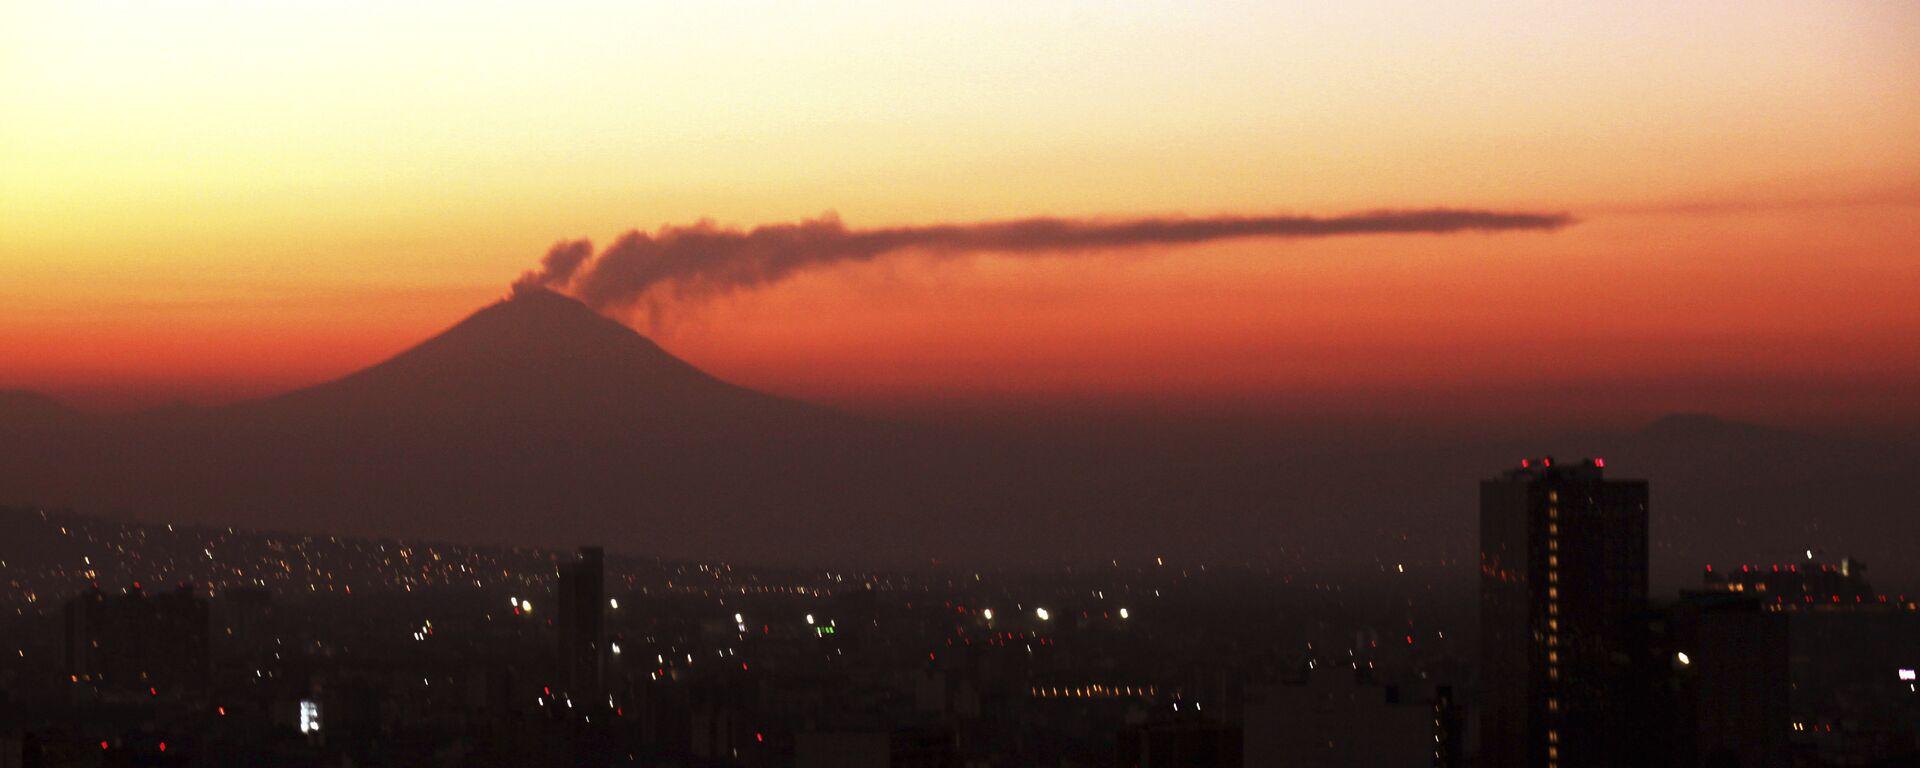 El volcan Popocatépetl (archivo) - Sputnik Mundo, 1920, 09.01.2020